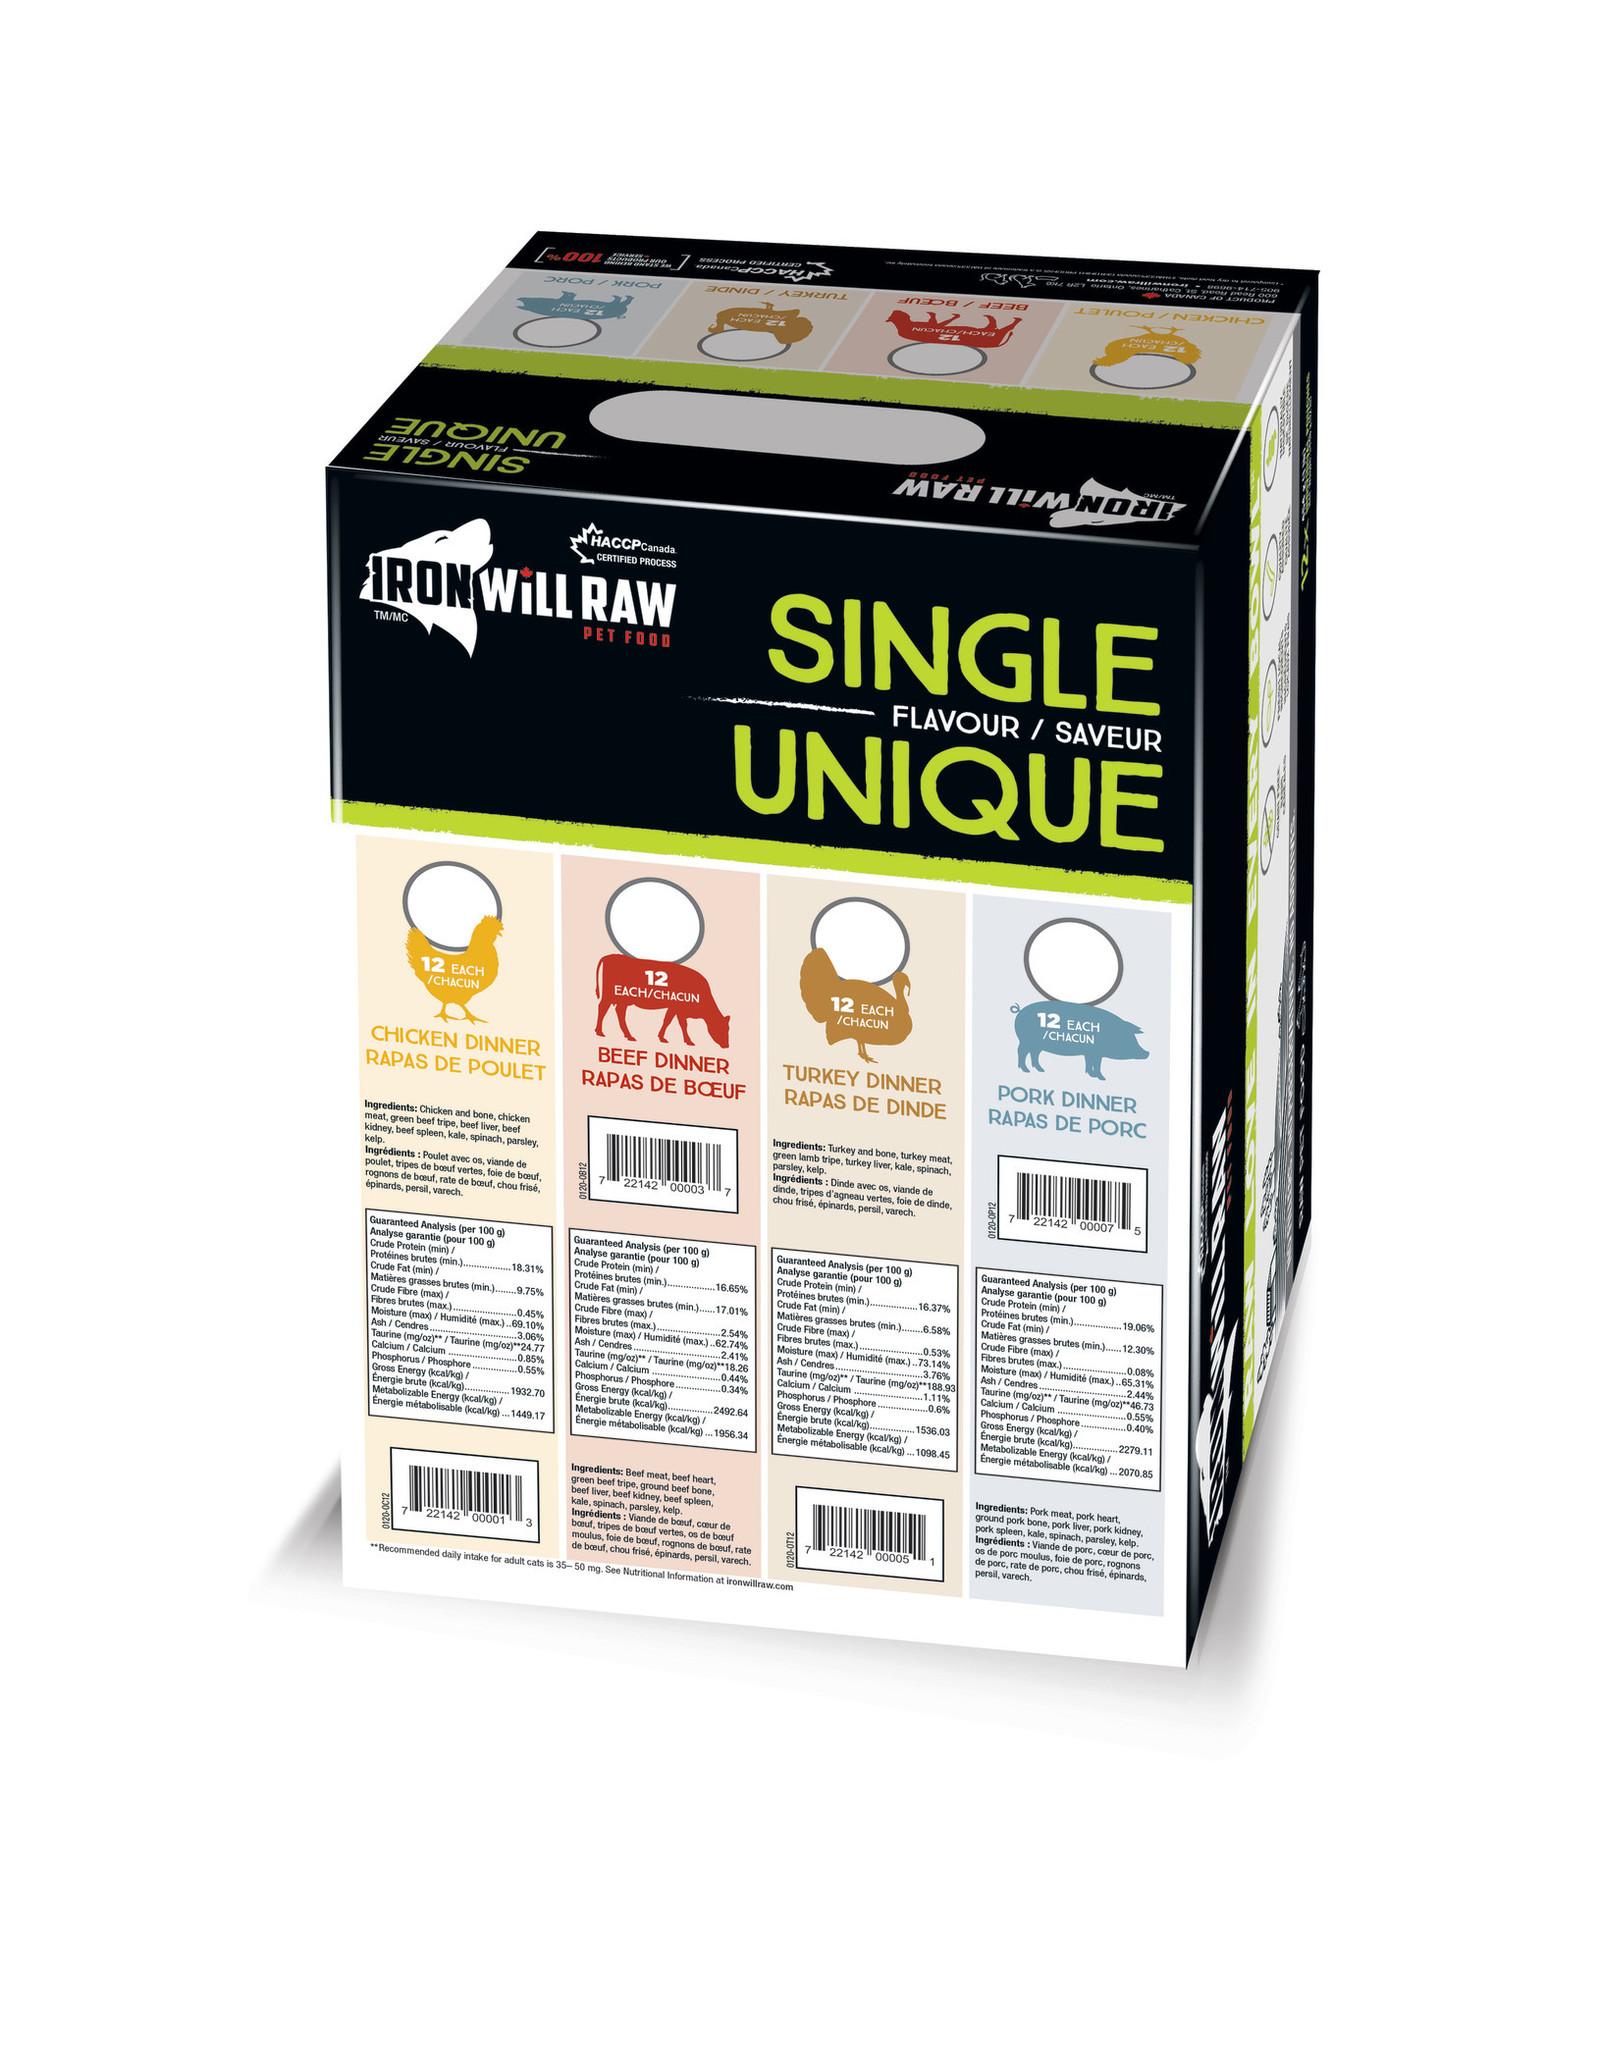 Iron Will Raw Iron Will Original Pork Dinner 12lb Box